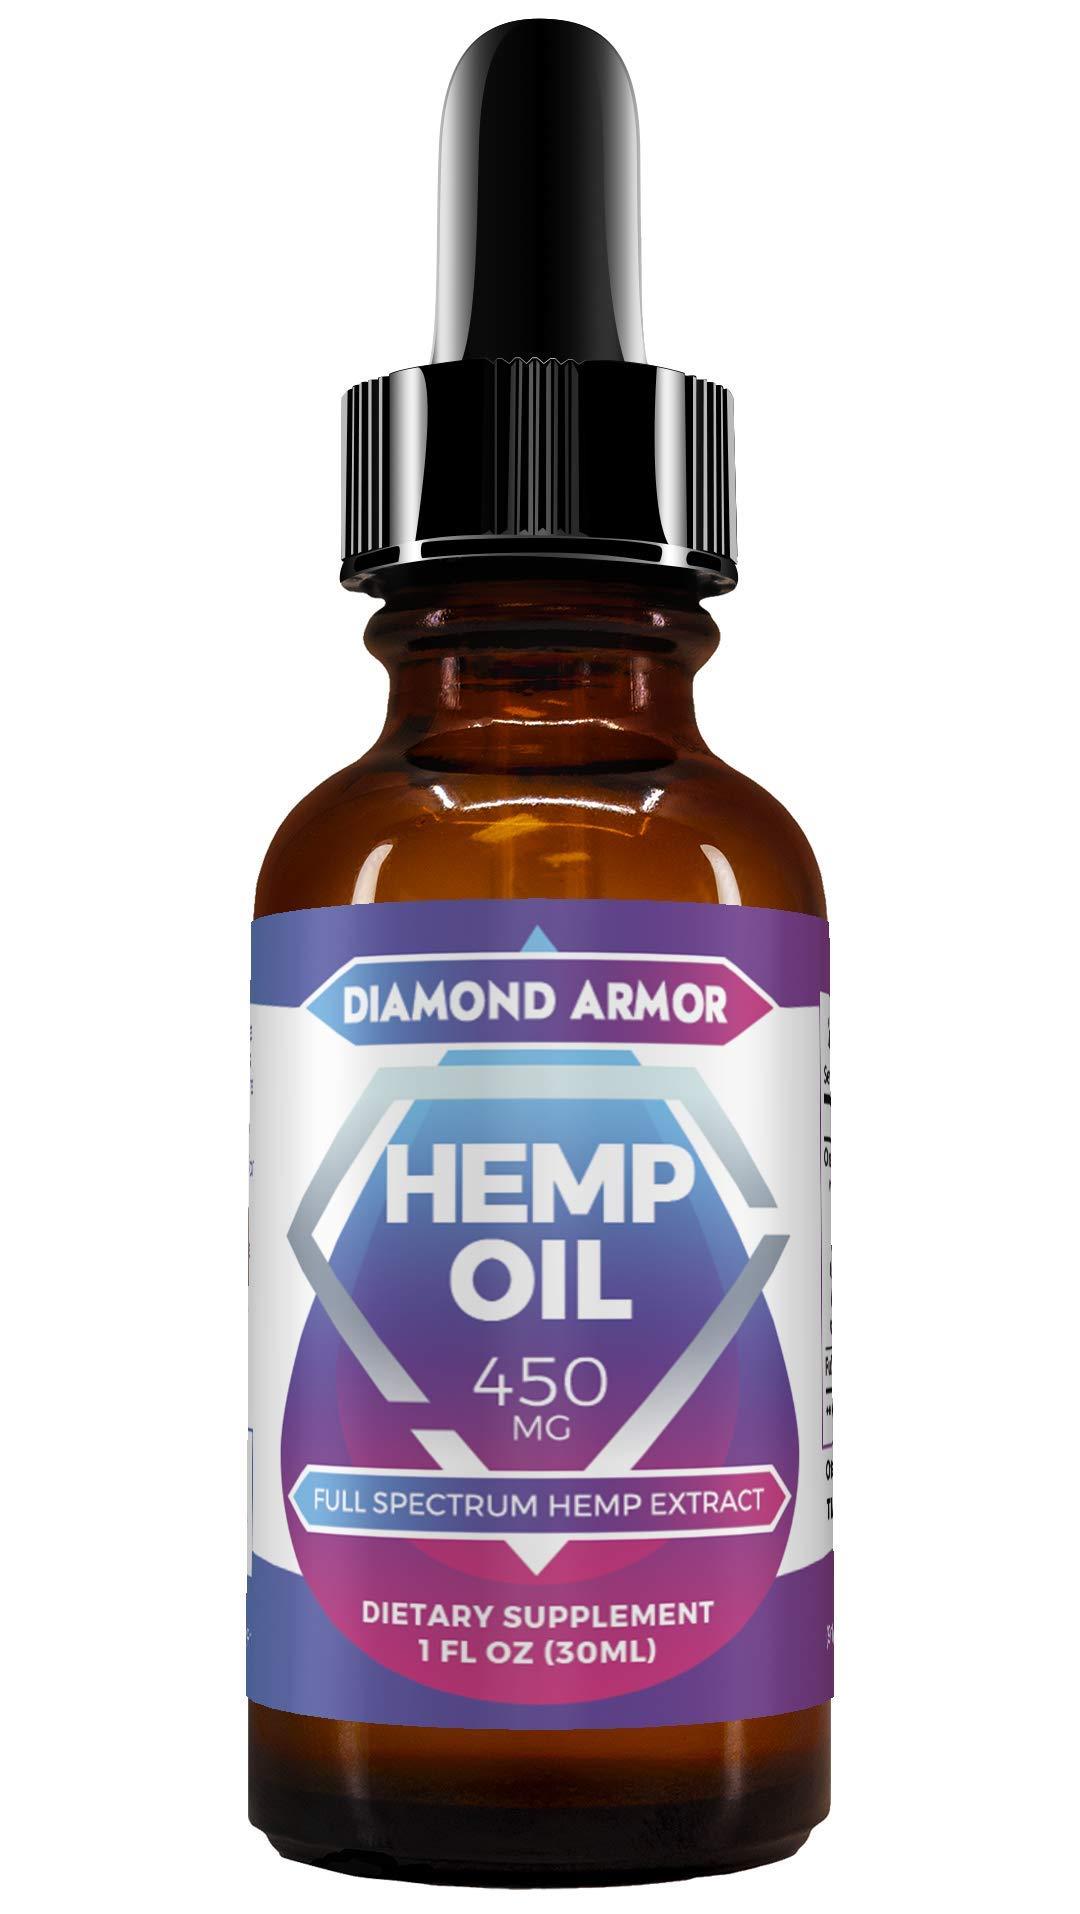 Full Spectrum Hemp Seed Oil Drops - 450mg | Promotes Anxiety Relief, Reduces Stress & Chronic Pain, Anti-Inflammatory & Sleep Aid with Omega 3, 6 & 9 Oils | ZeroTHC CBD Cannabidiol - Mint Flavor